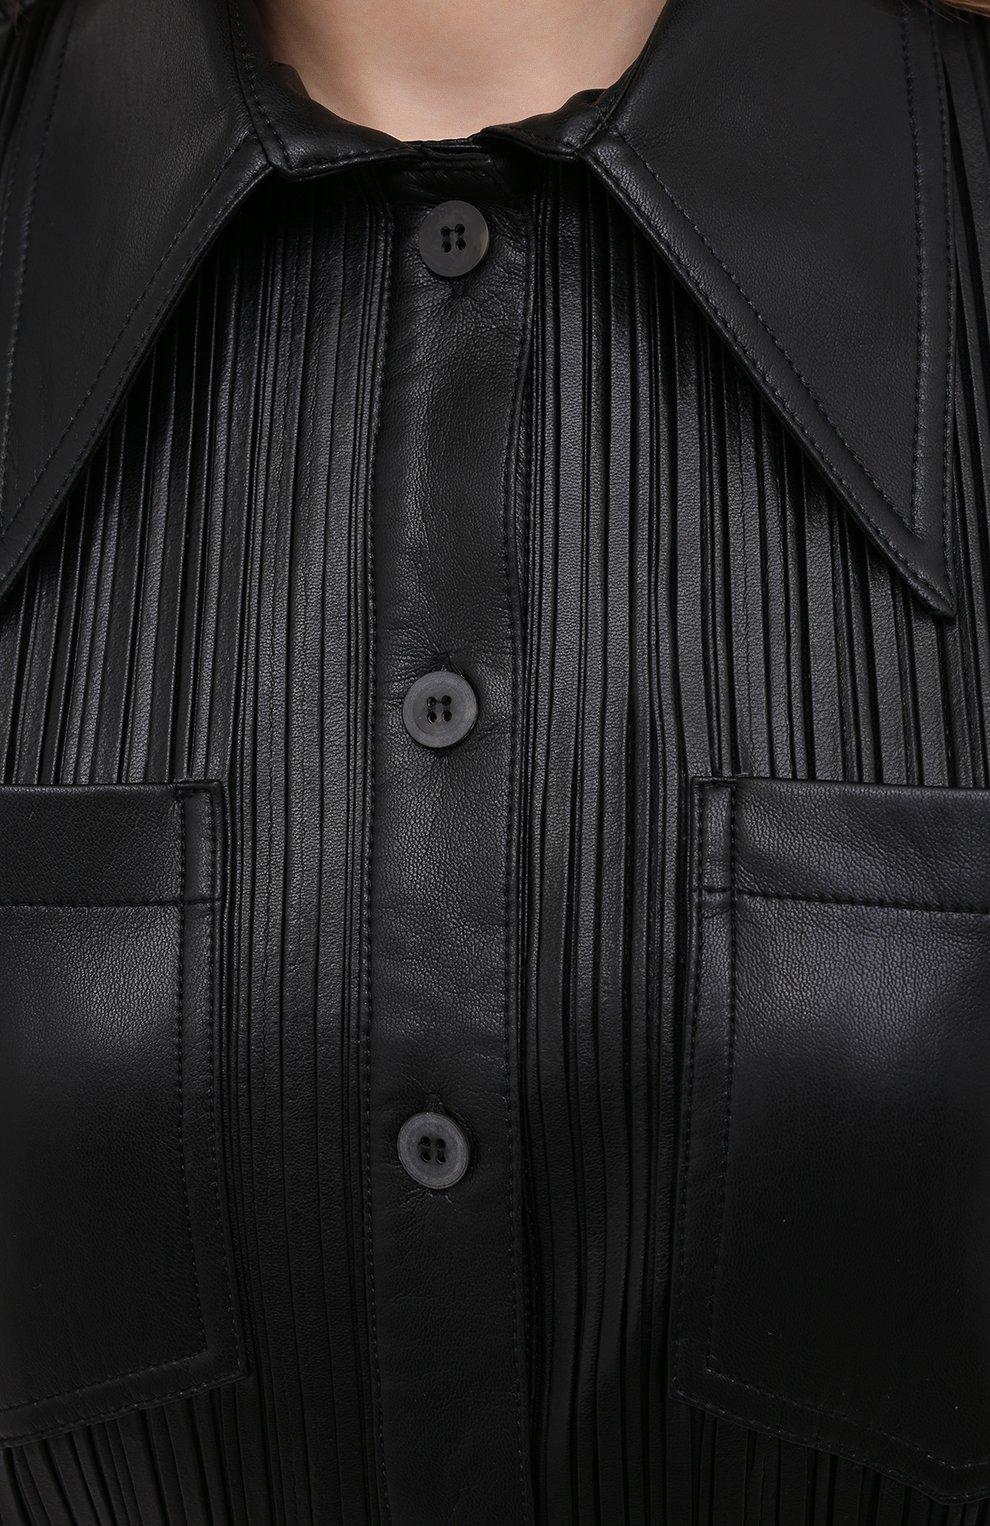 Женская рубашка NANUSHKA черного цвета, арт. BLAINE_BLACK PLEAT_VEGAN LEATHER | Фото 5